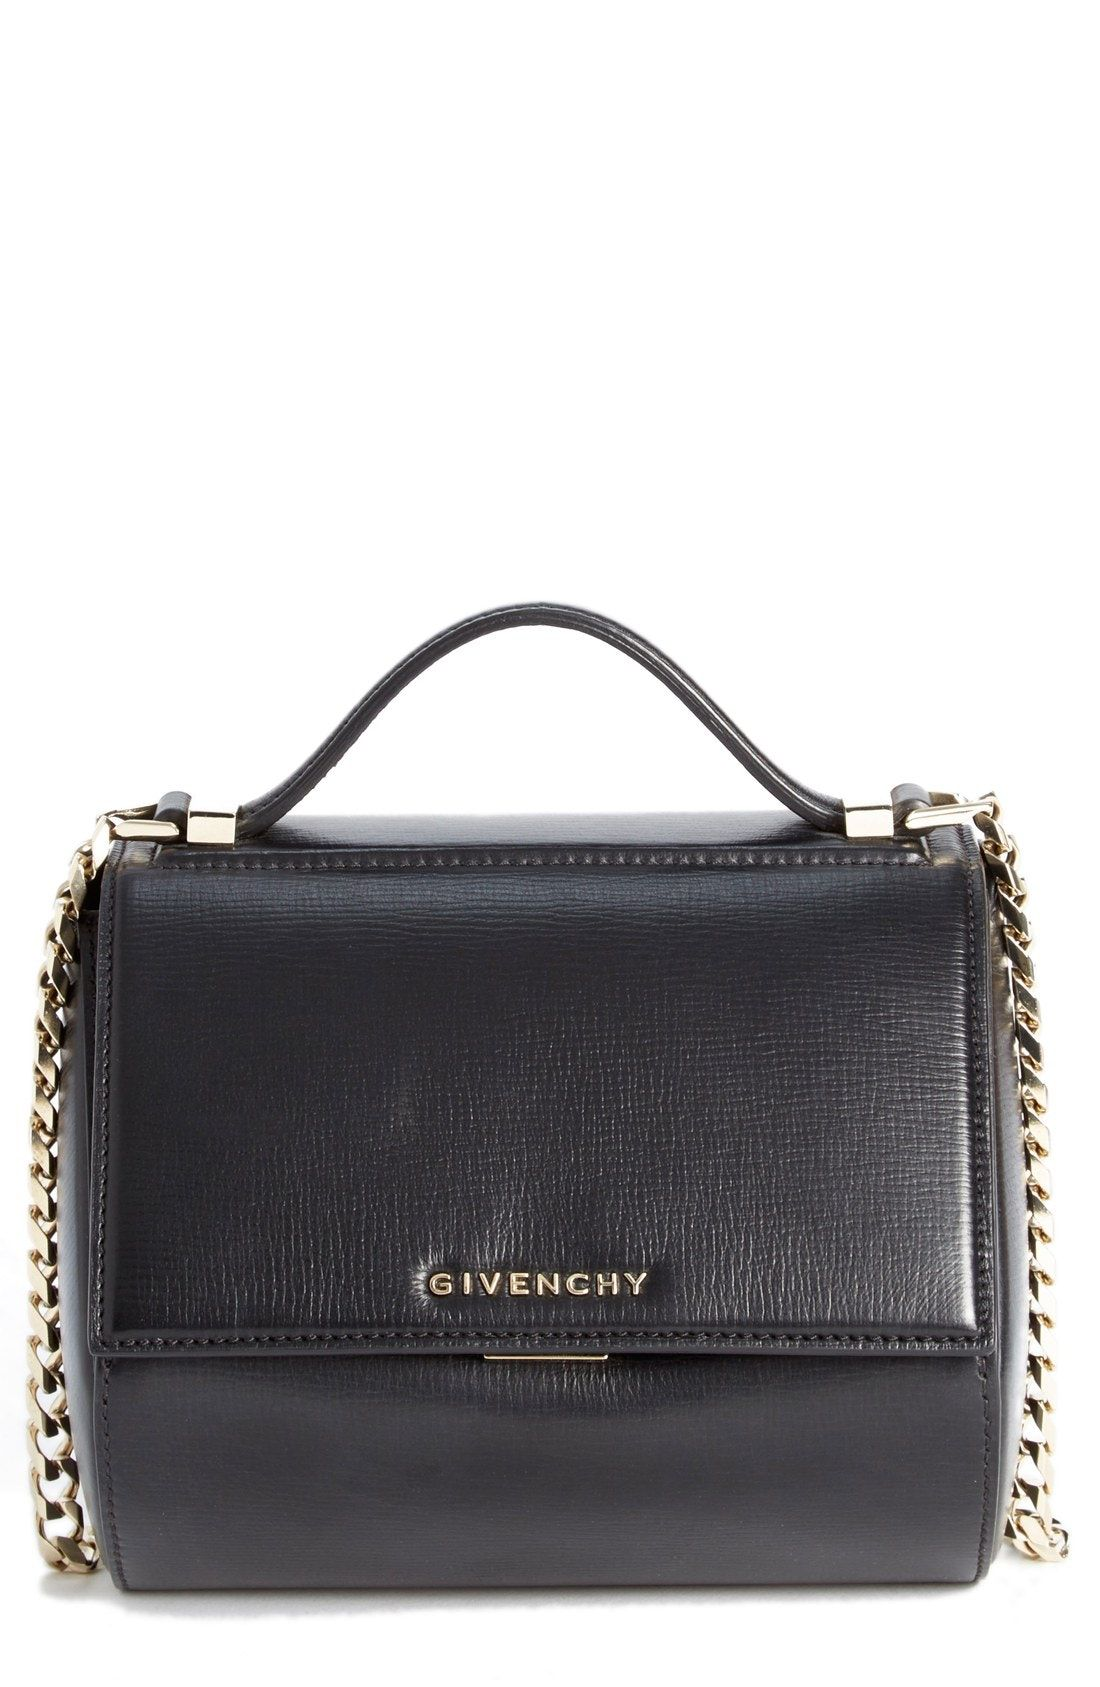 372653d742 New Givenchy Mini Pandora Box - Palma Leather Shoulder Bag fashion online.    2090   shop.seehandbags